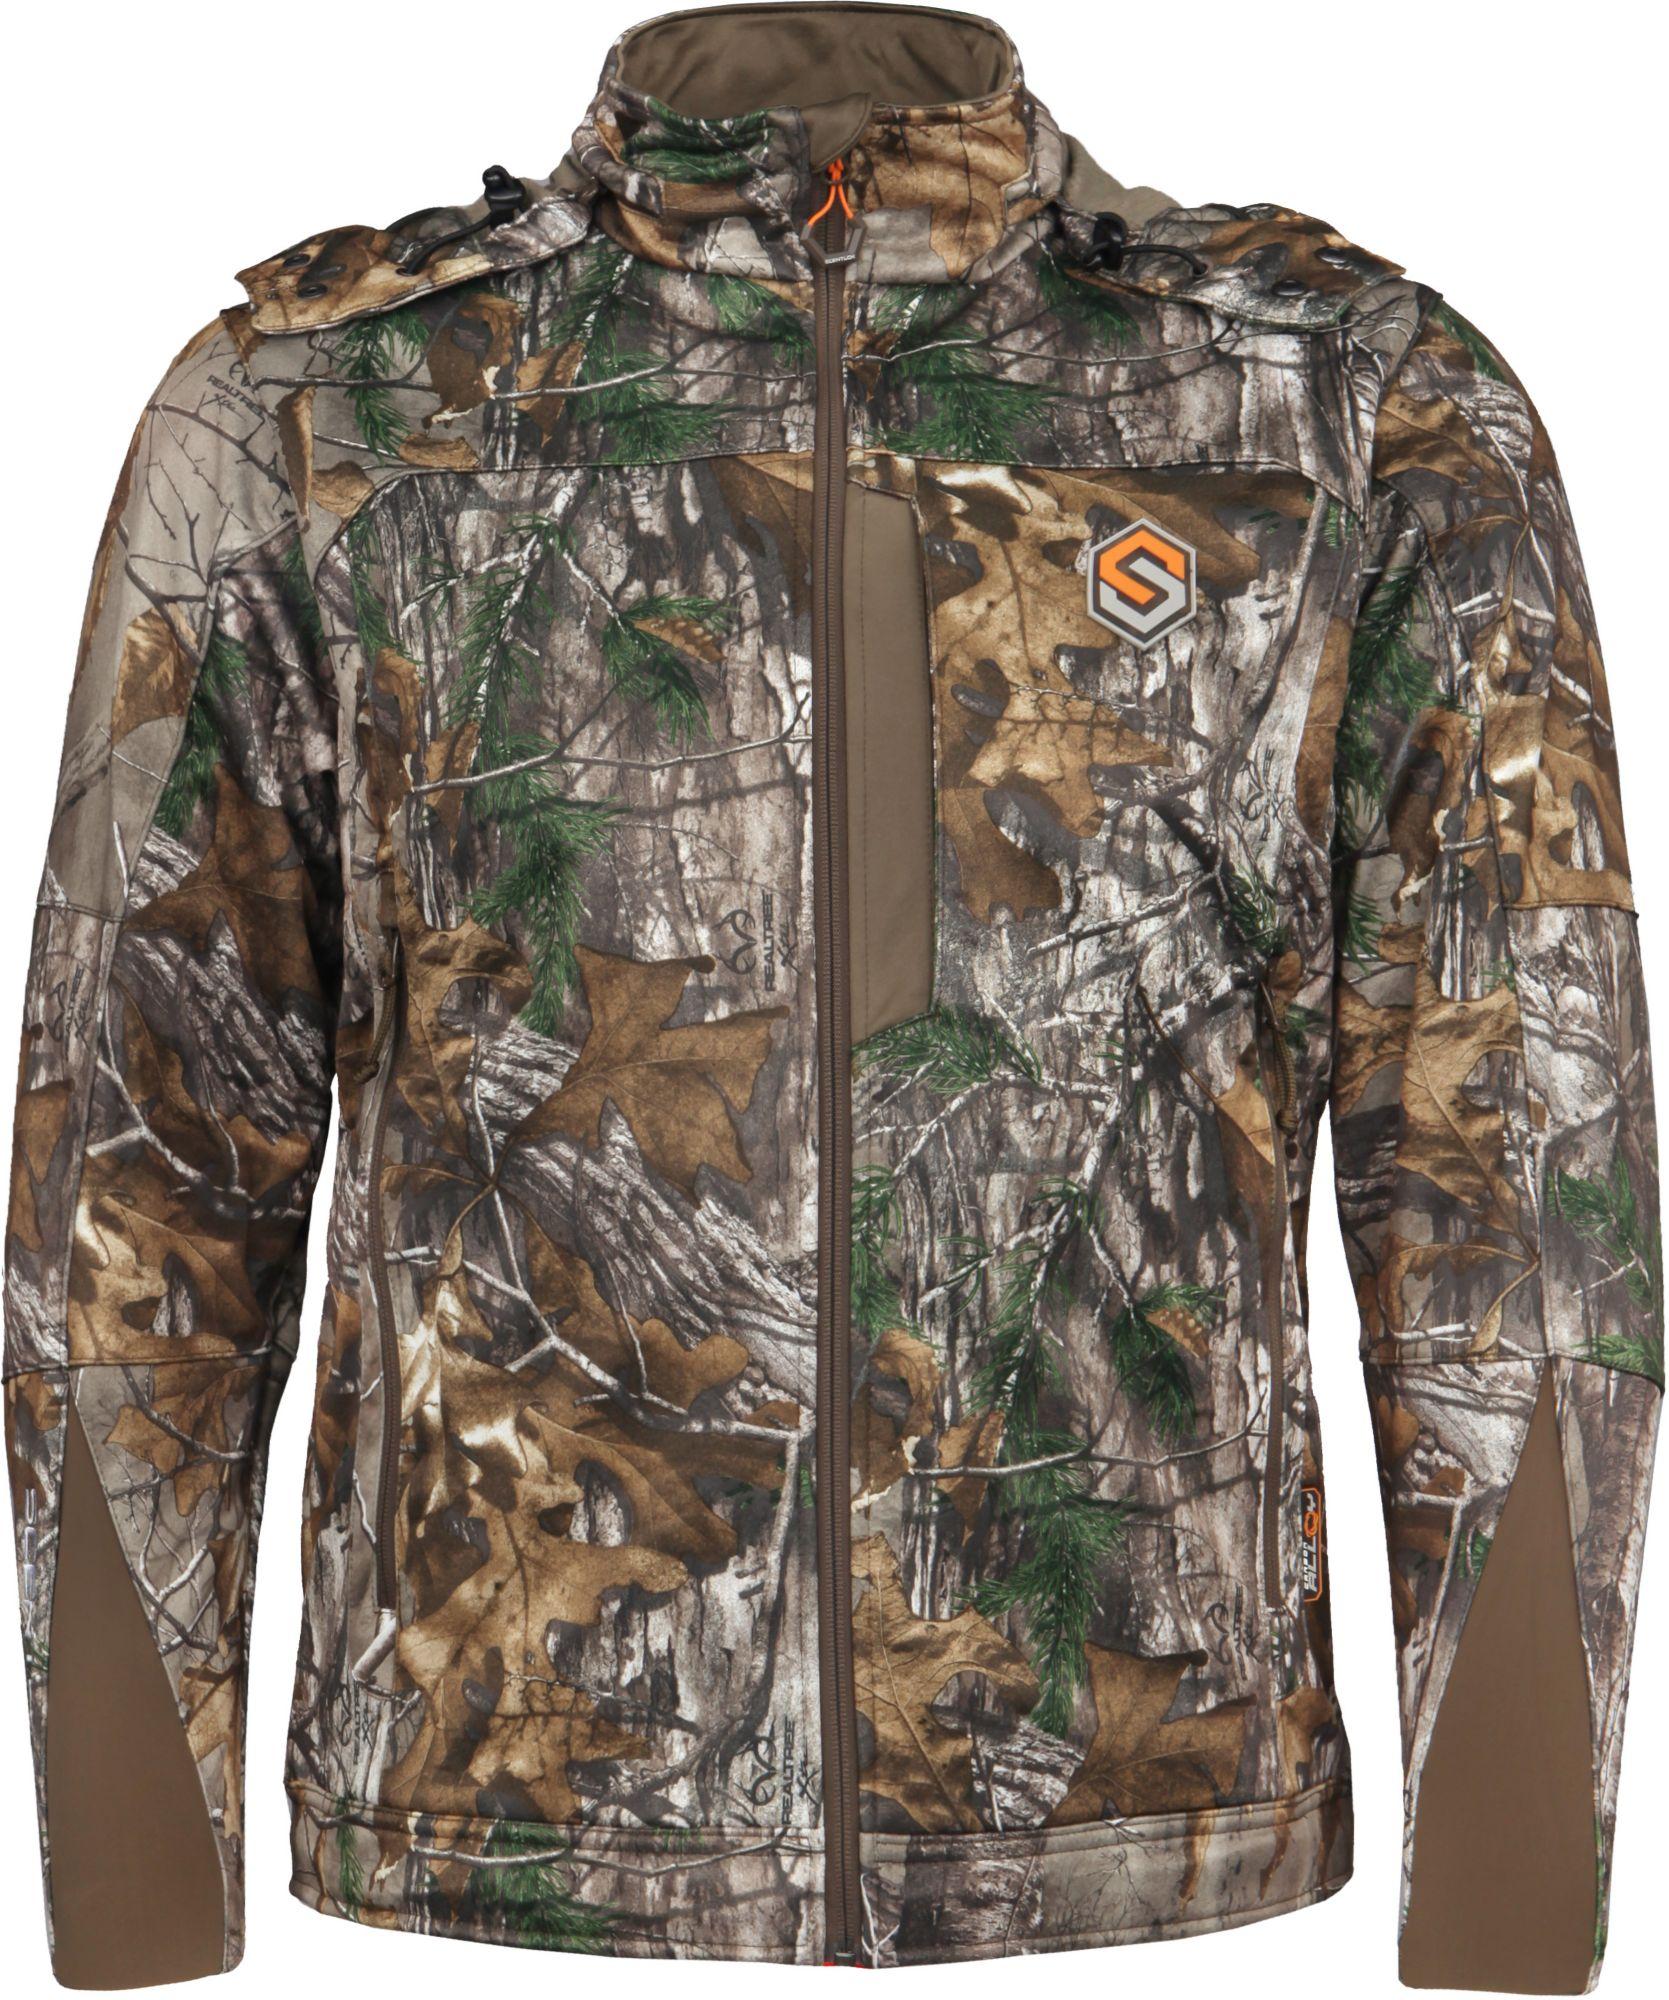 ScentLok Men's Helix Soft Shell Hunting Jacket, Size: Medium, Brown thumbnail